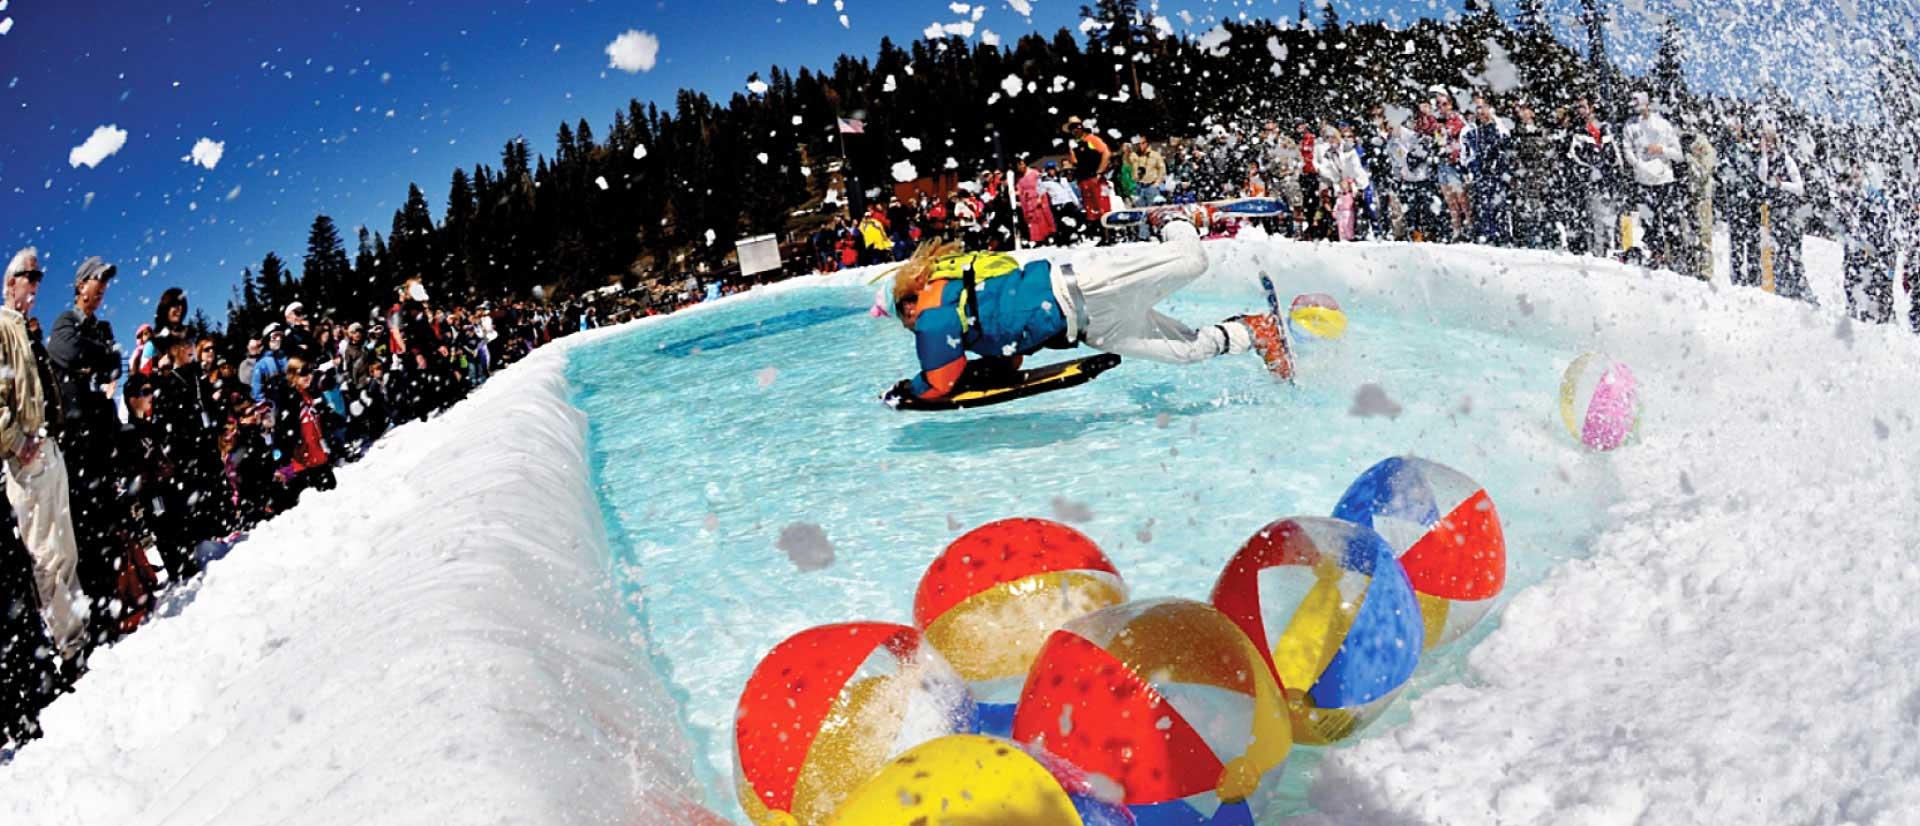 Dodge Ridge Ski Area Events and Activities